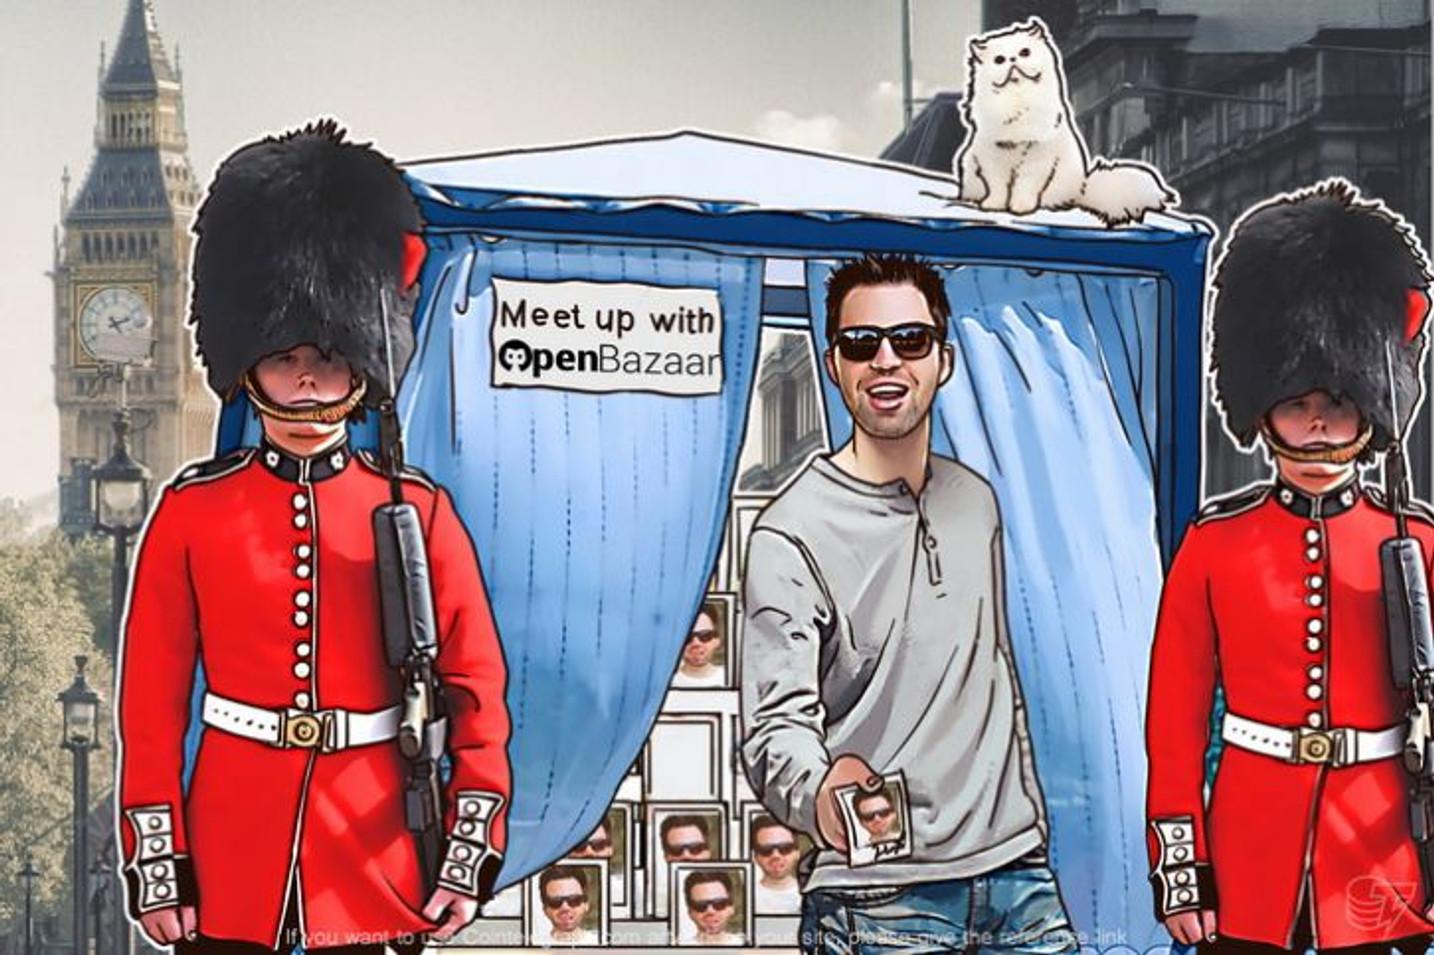 OpenBazaar-ov MeetUp u Londonu